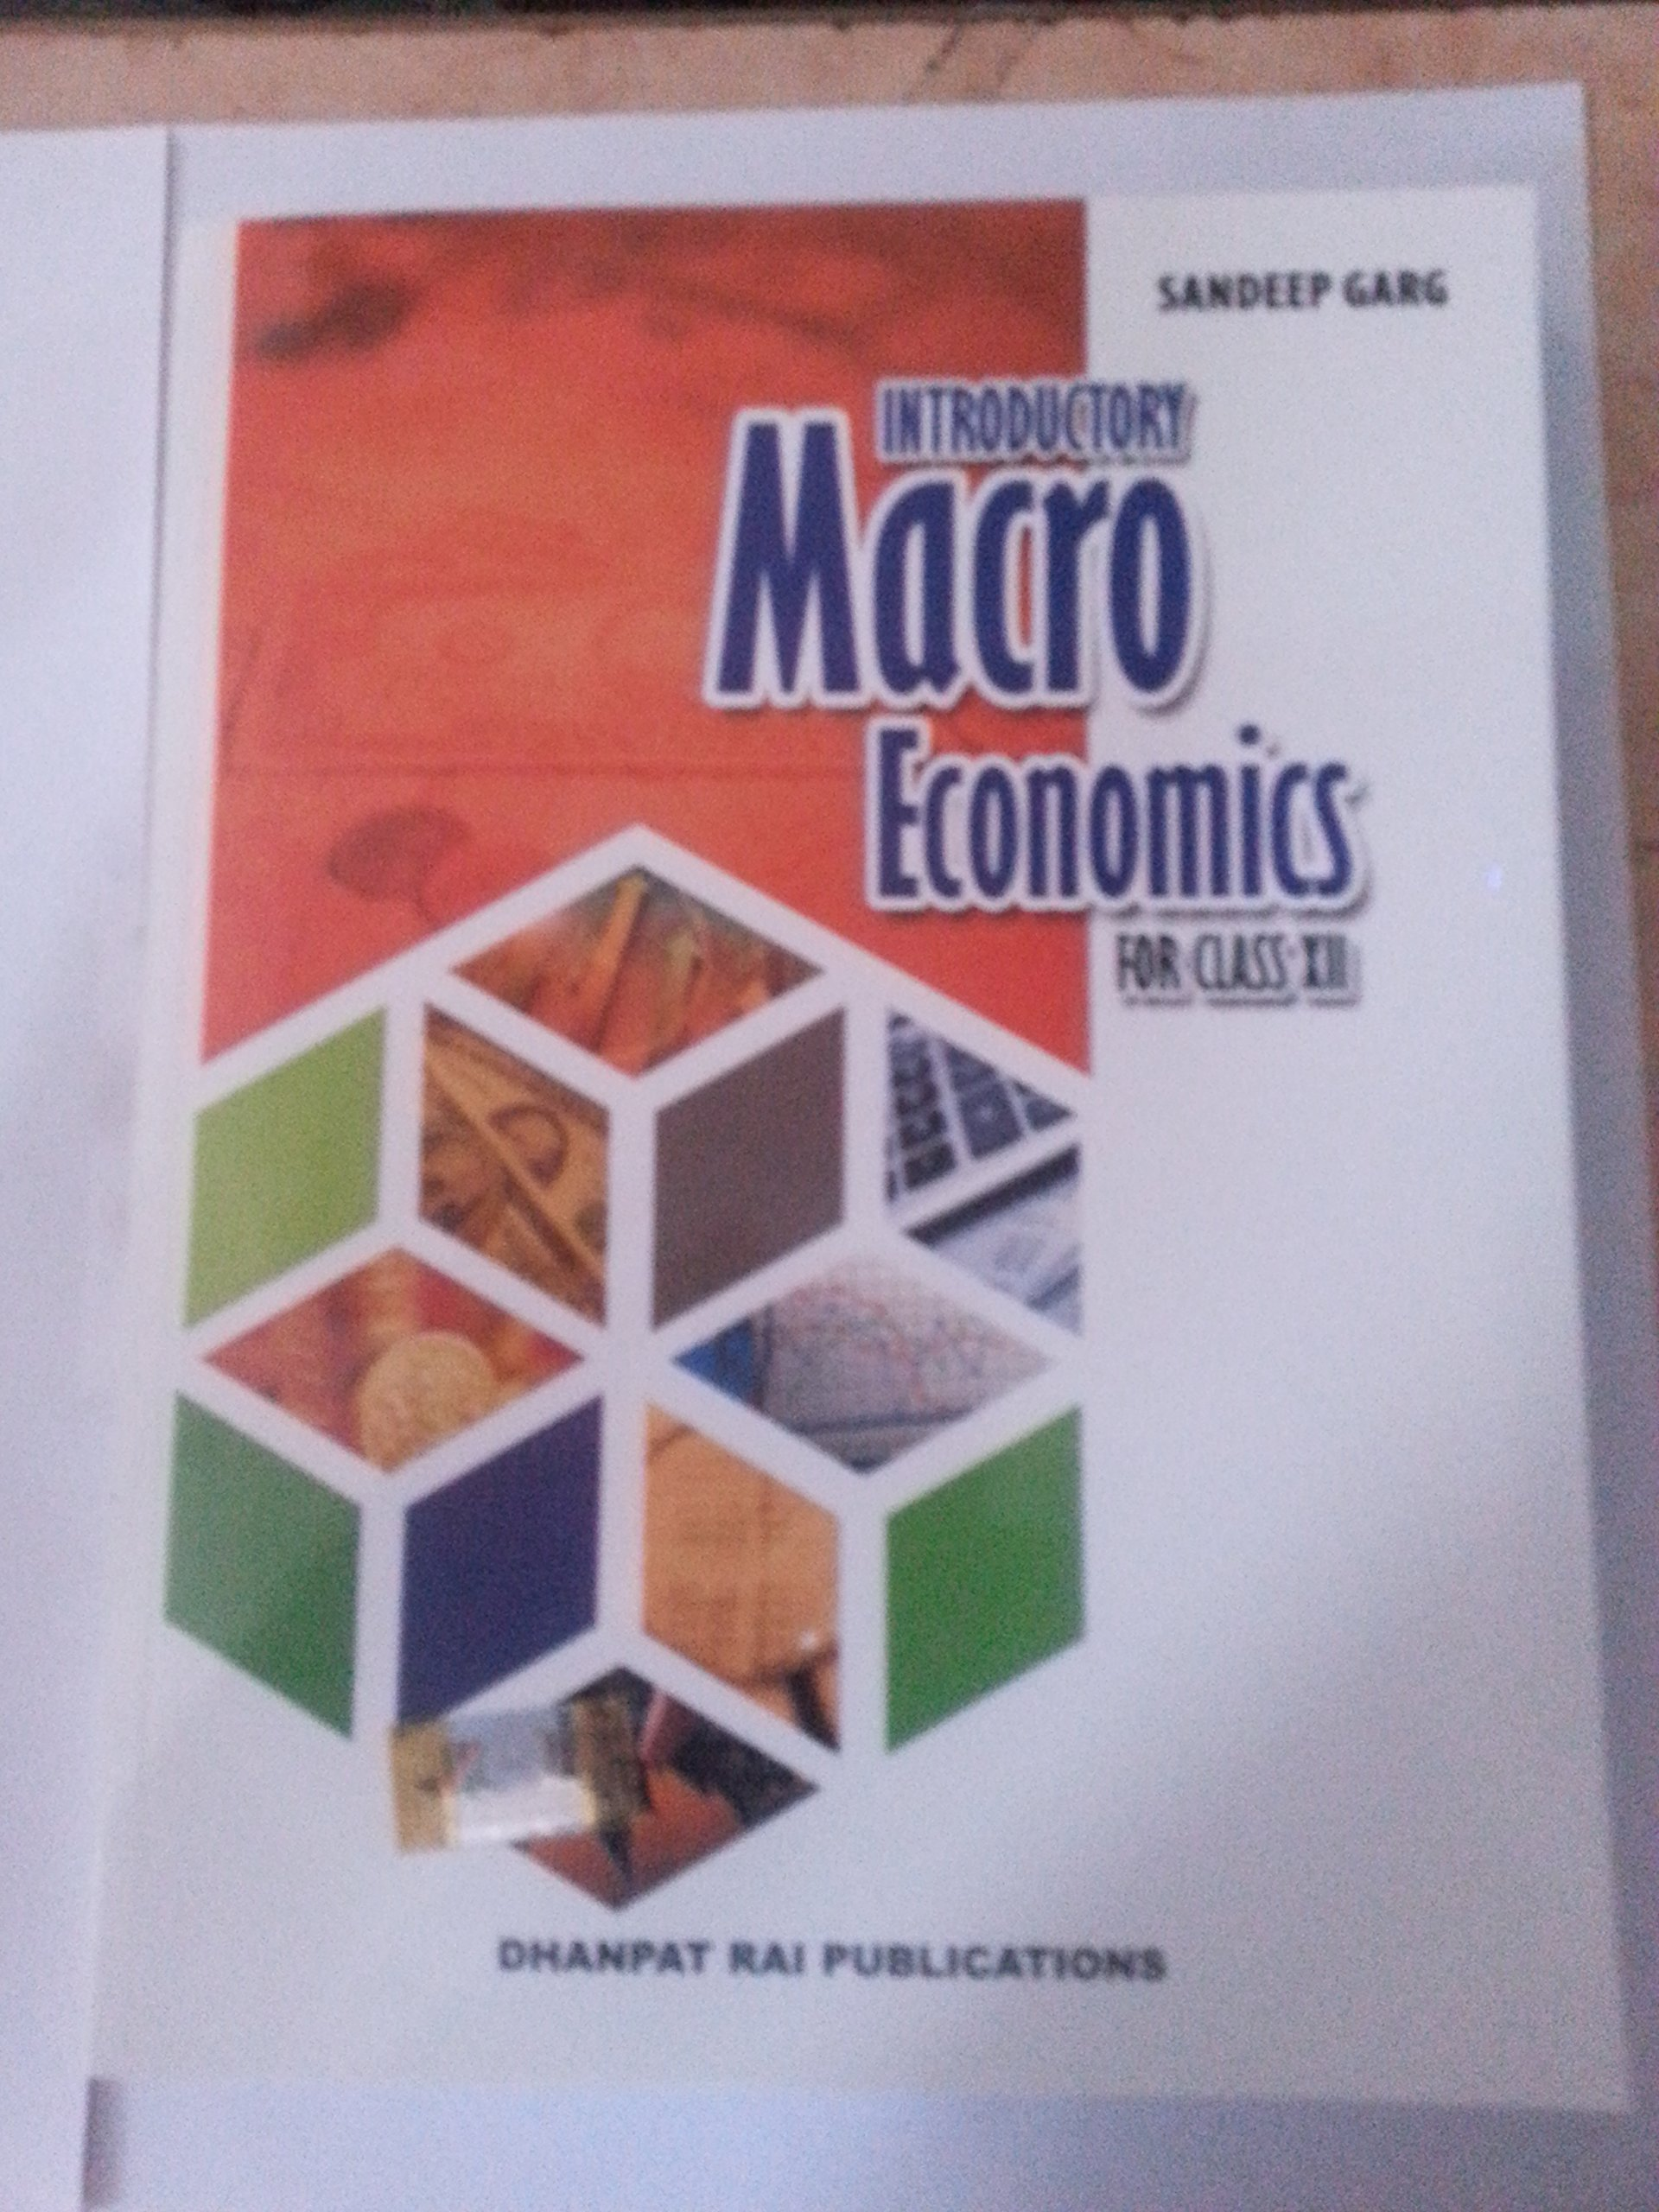 Buy SANDEEP GARG MACRO ECONOMICS XII Book Online at Low Prices in India |  SANDEEP GARG MACRO ECONOMICS XII Reviews & Ratings - Amazon.in